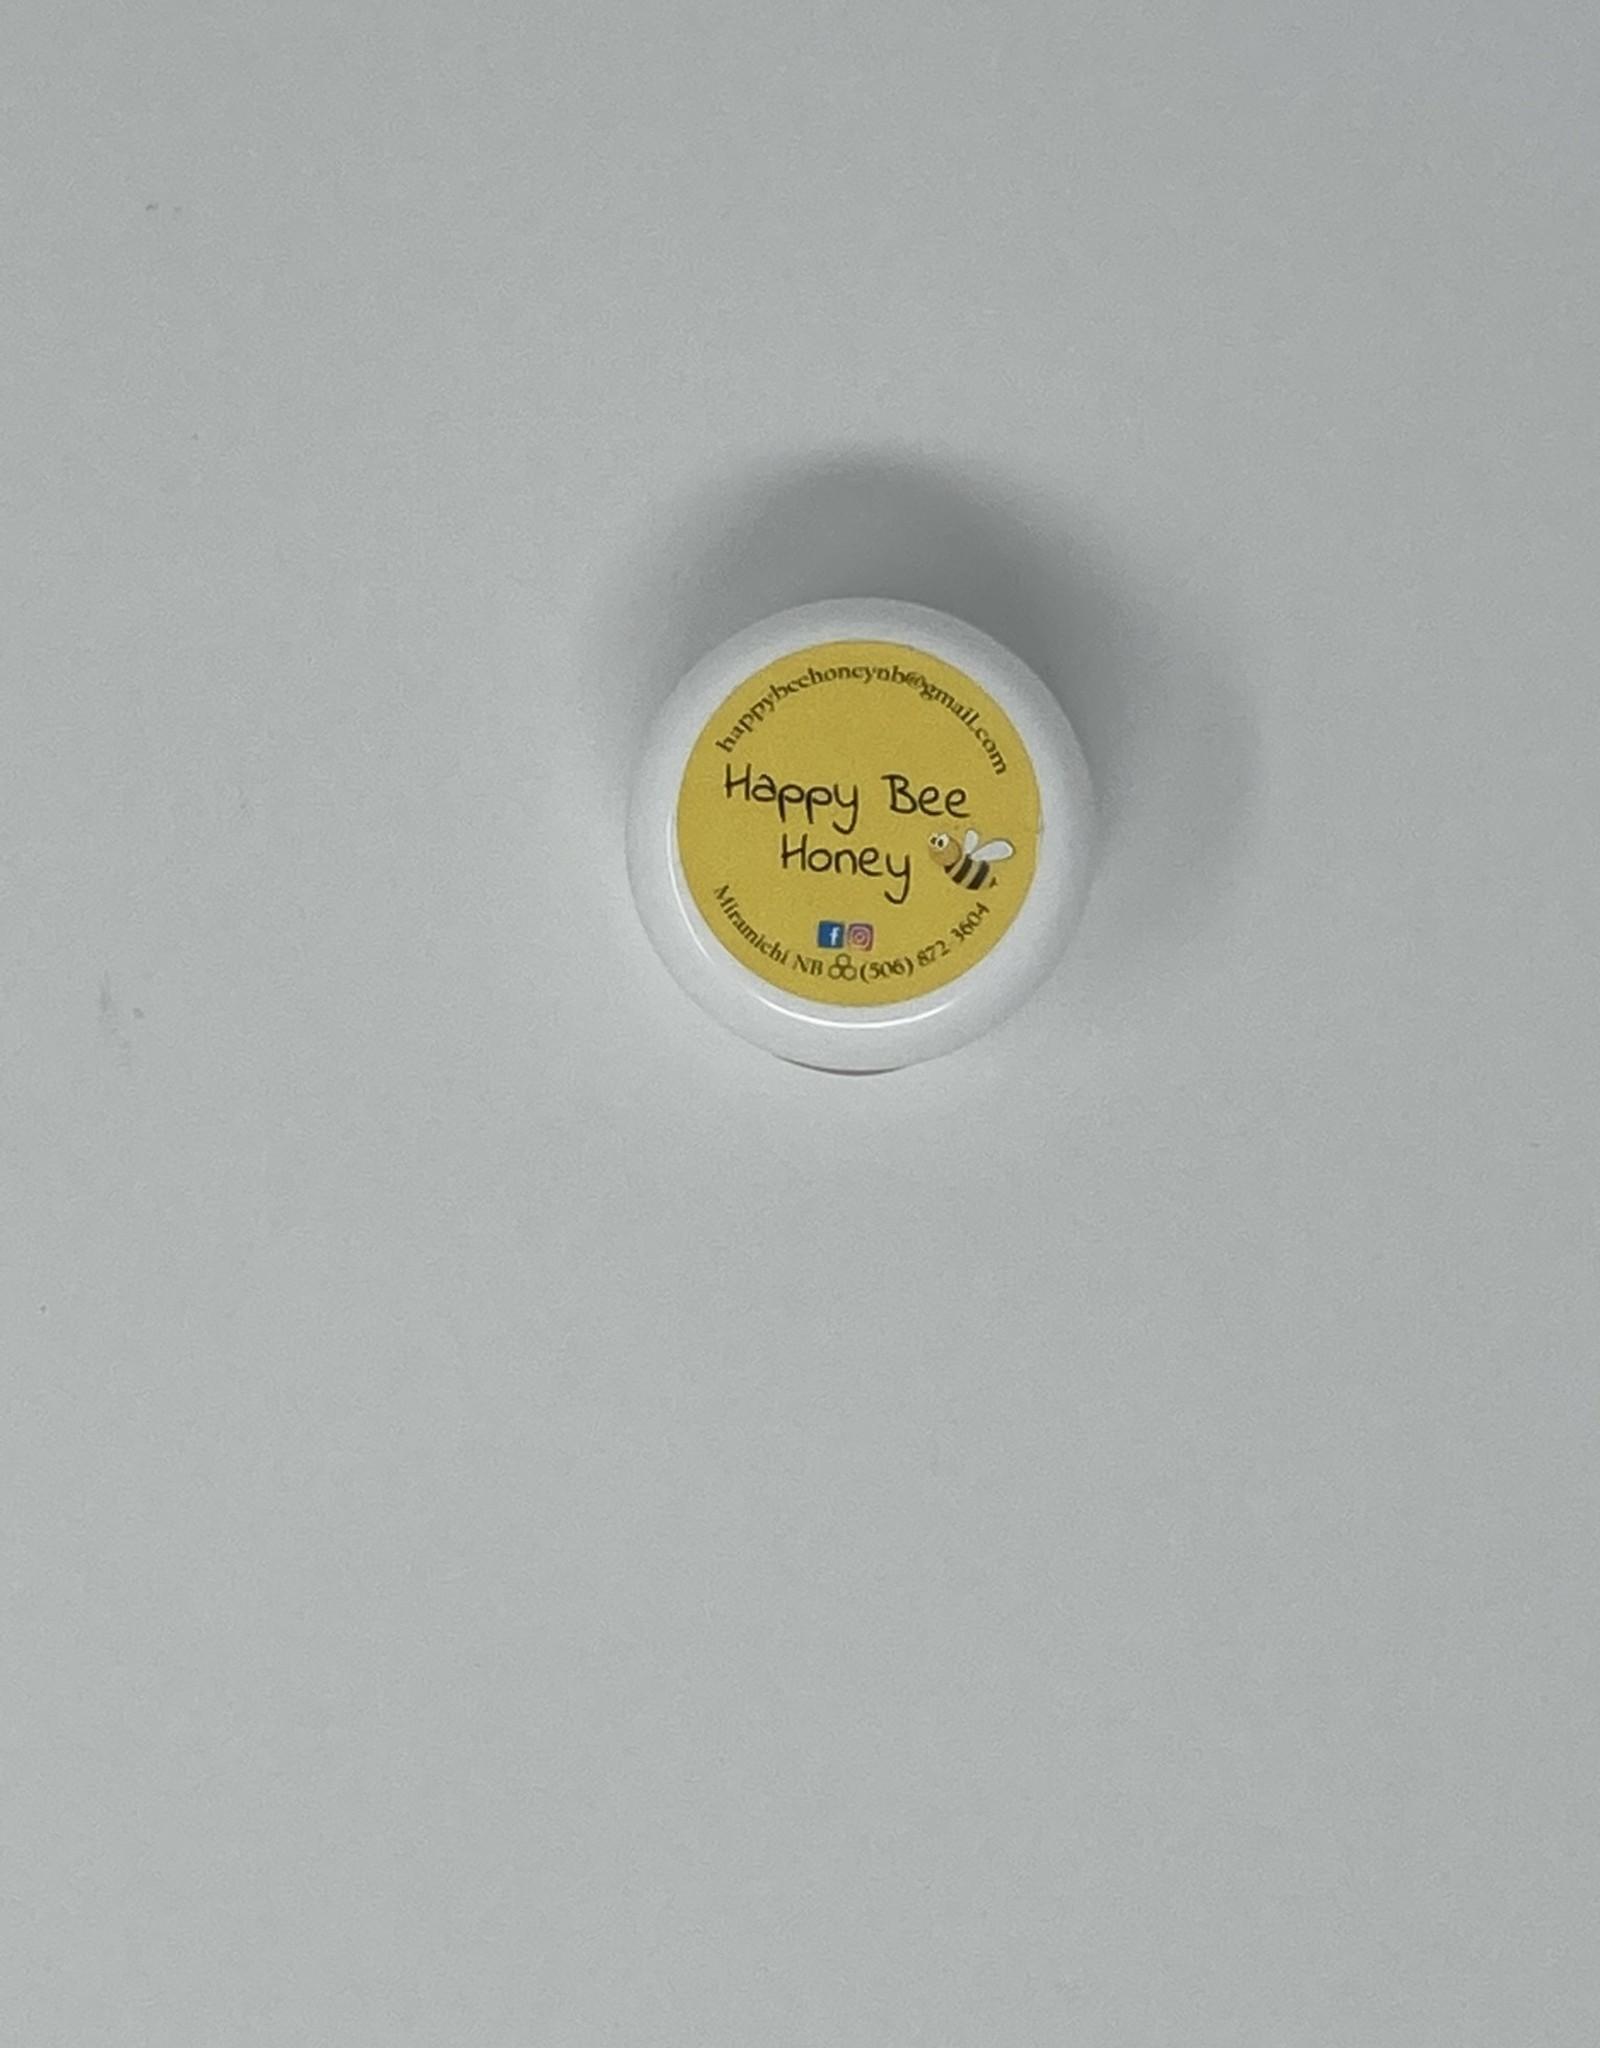 Happy Bee Honey Happy Bee Honey - Hand Cream